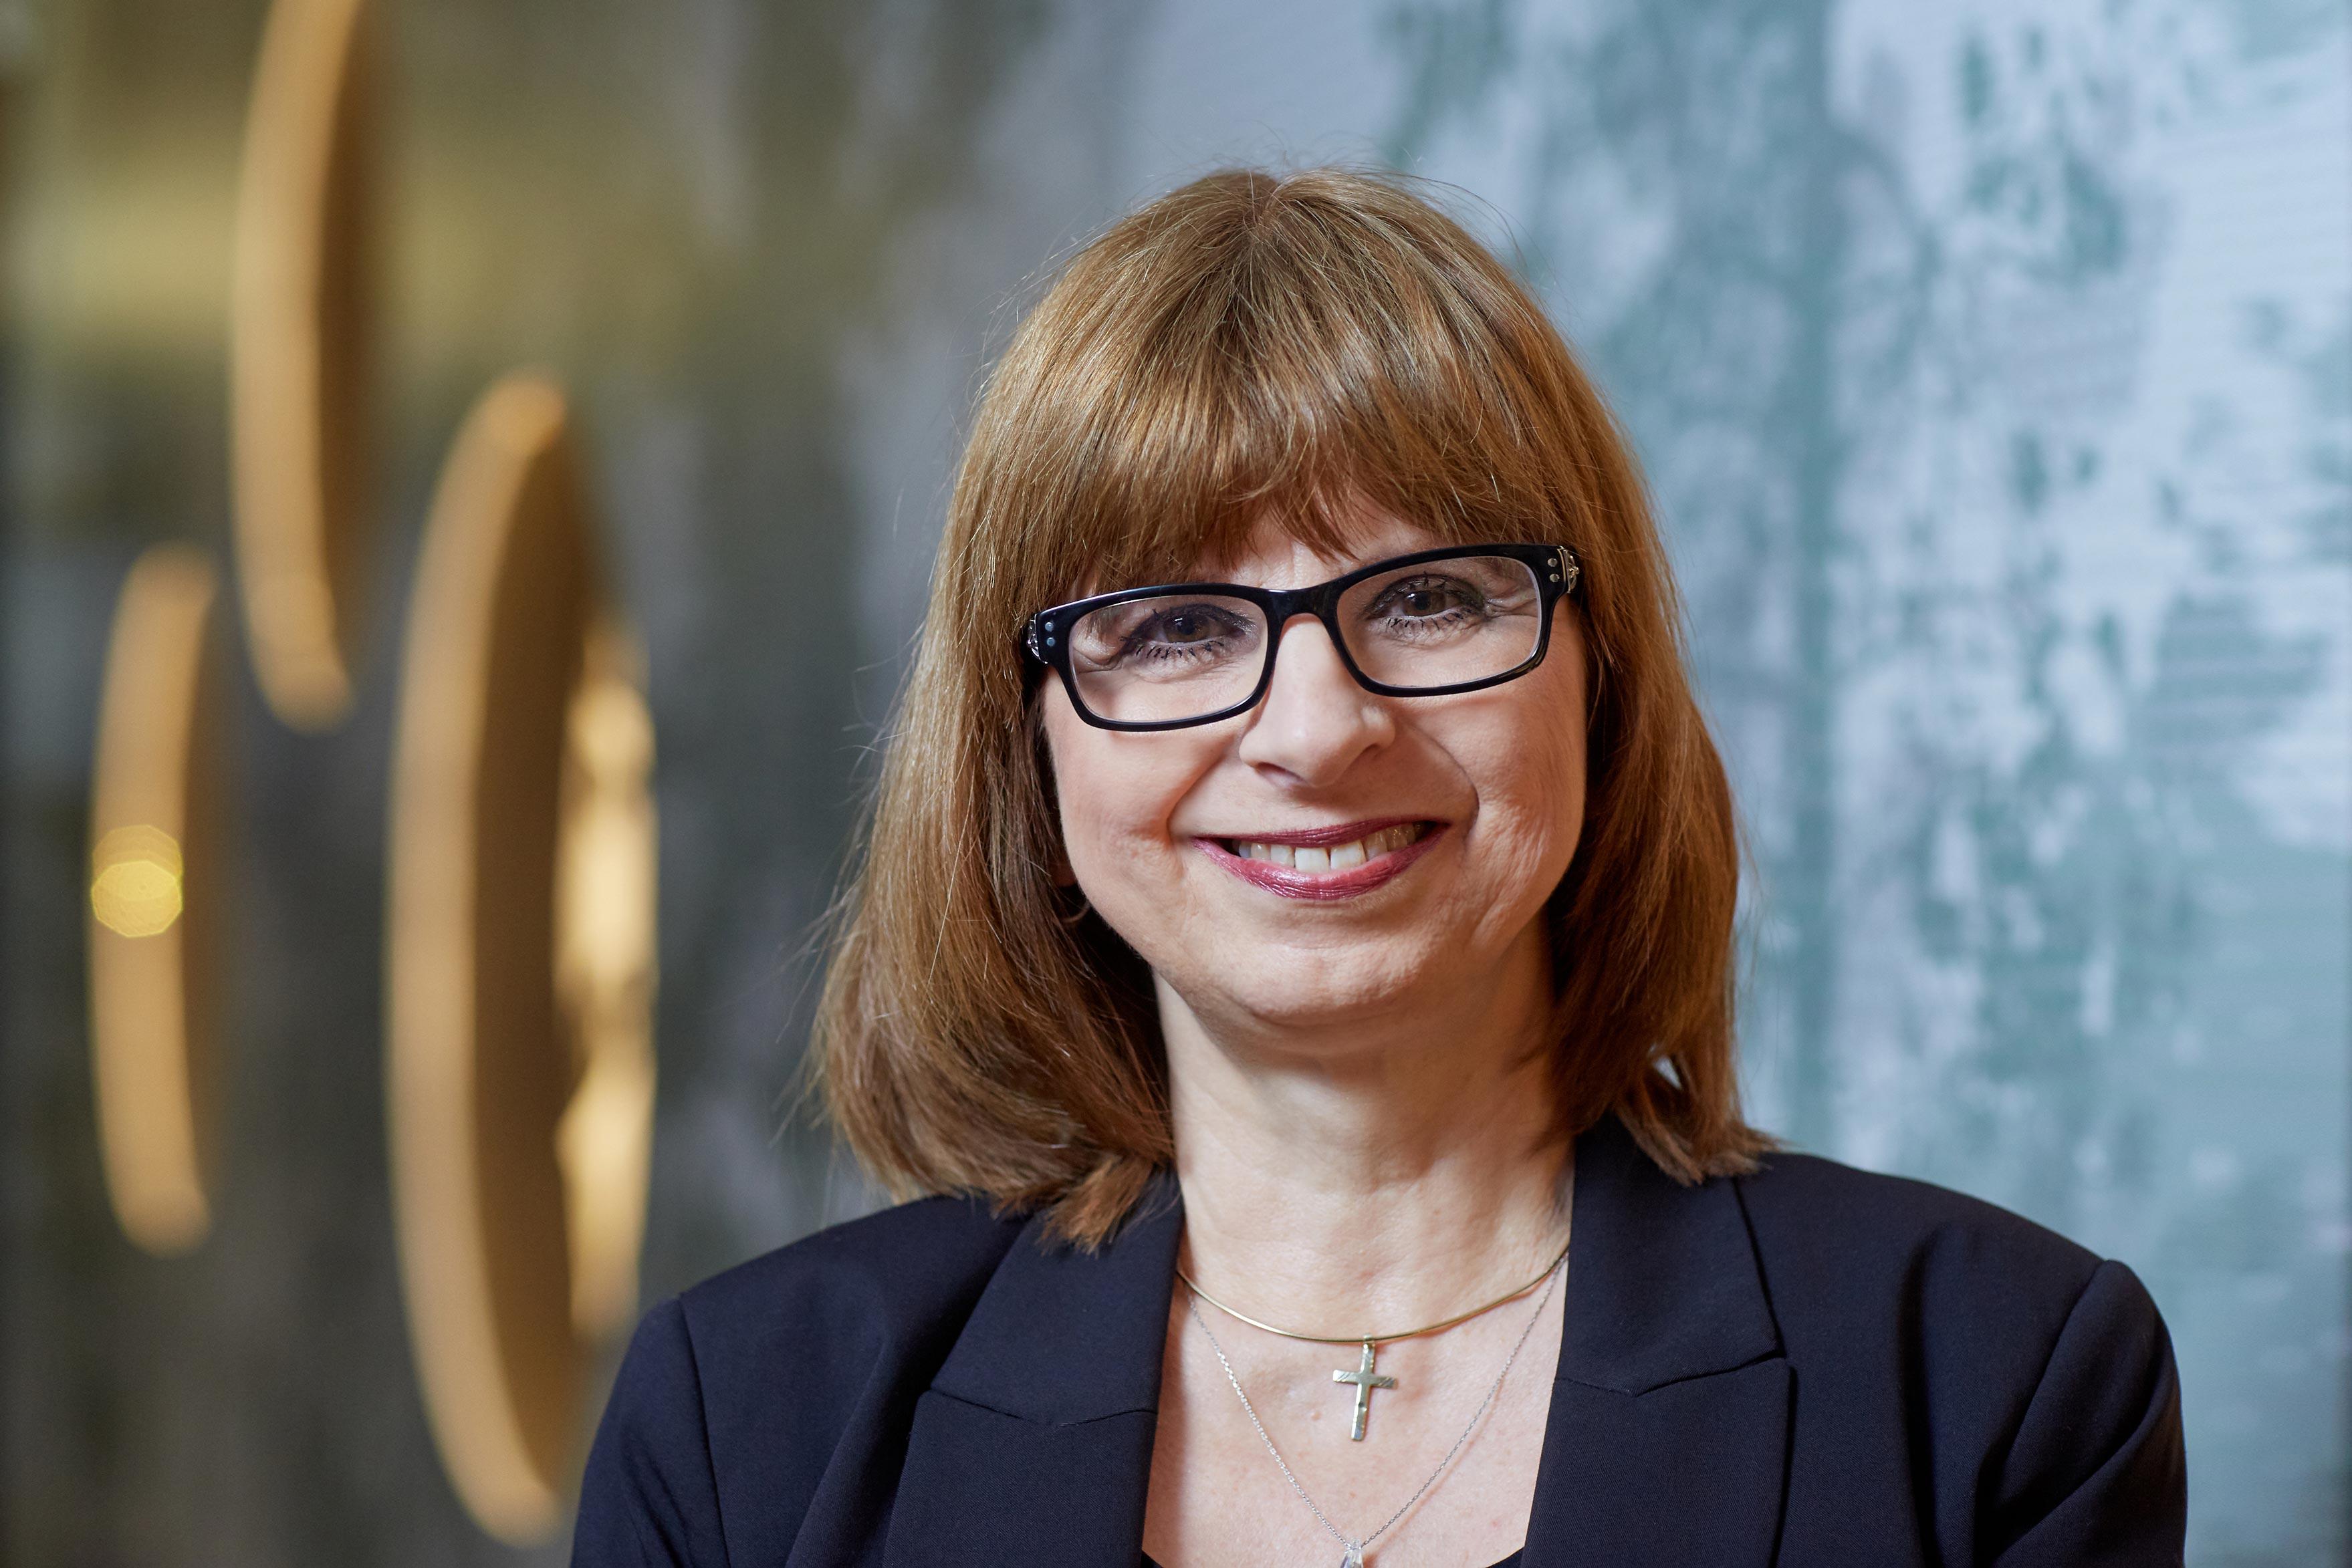 Silvia Kemler